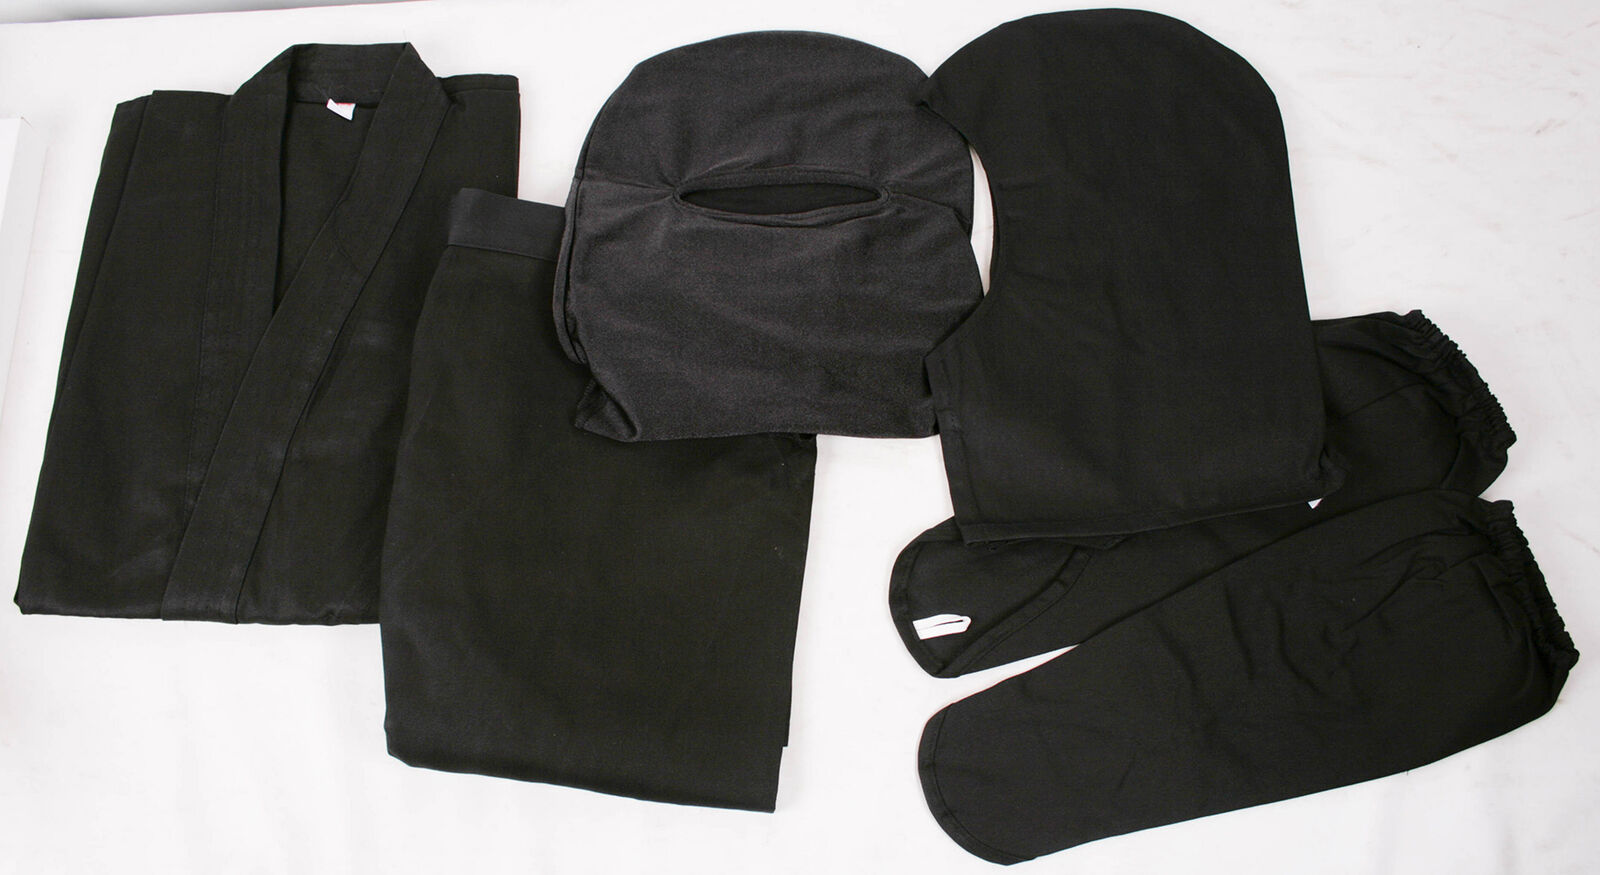 Master Cutlery Ninja Uniforme Tuta Karate S